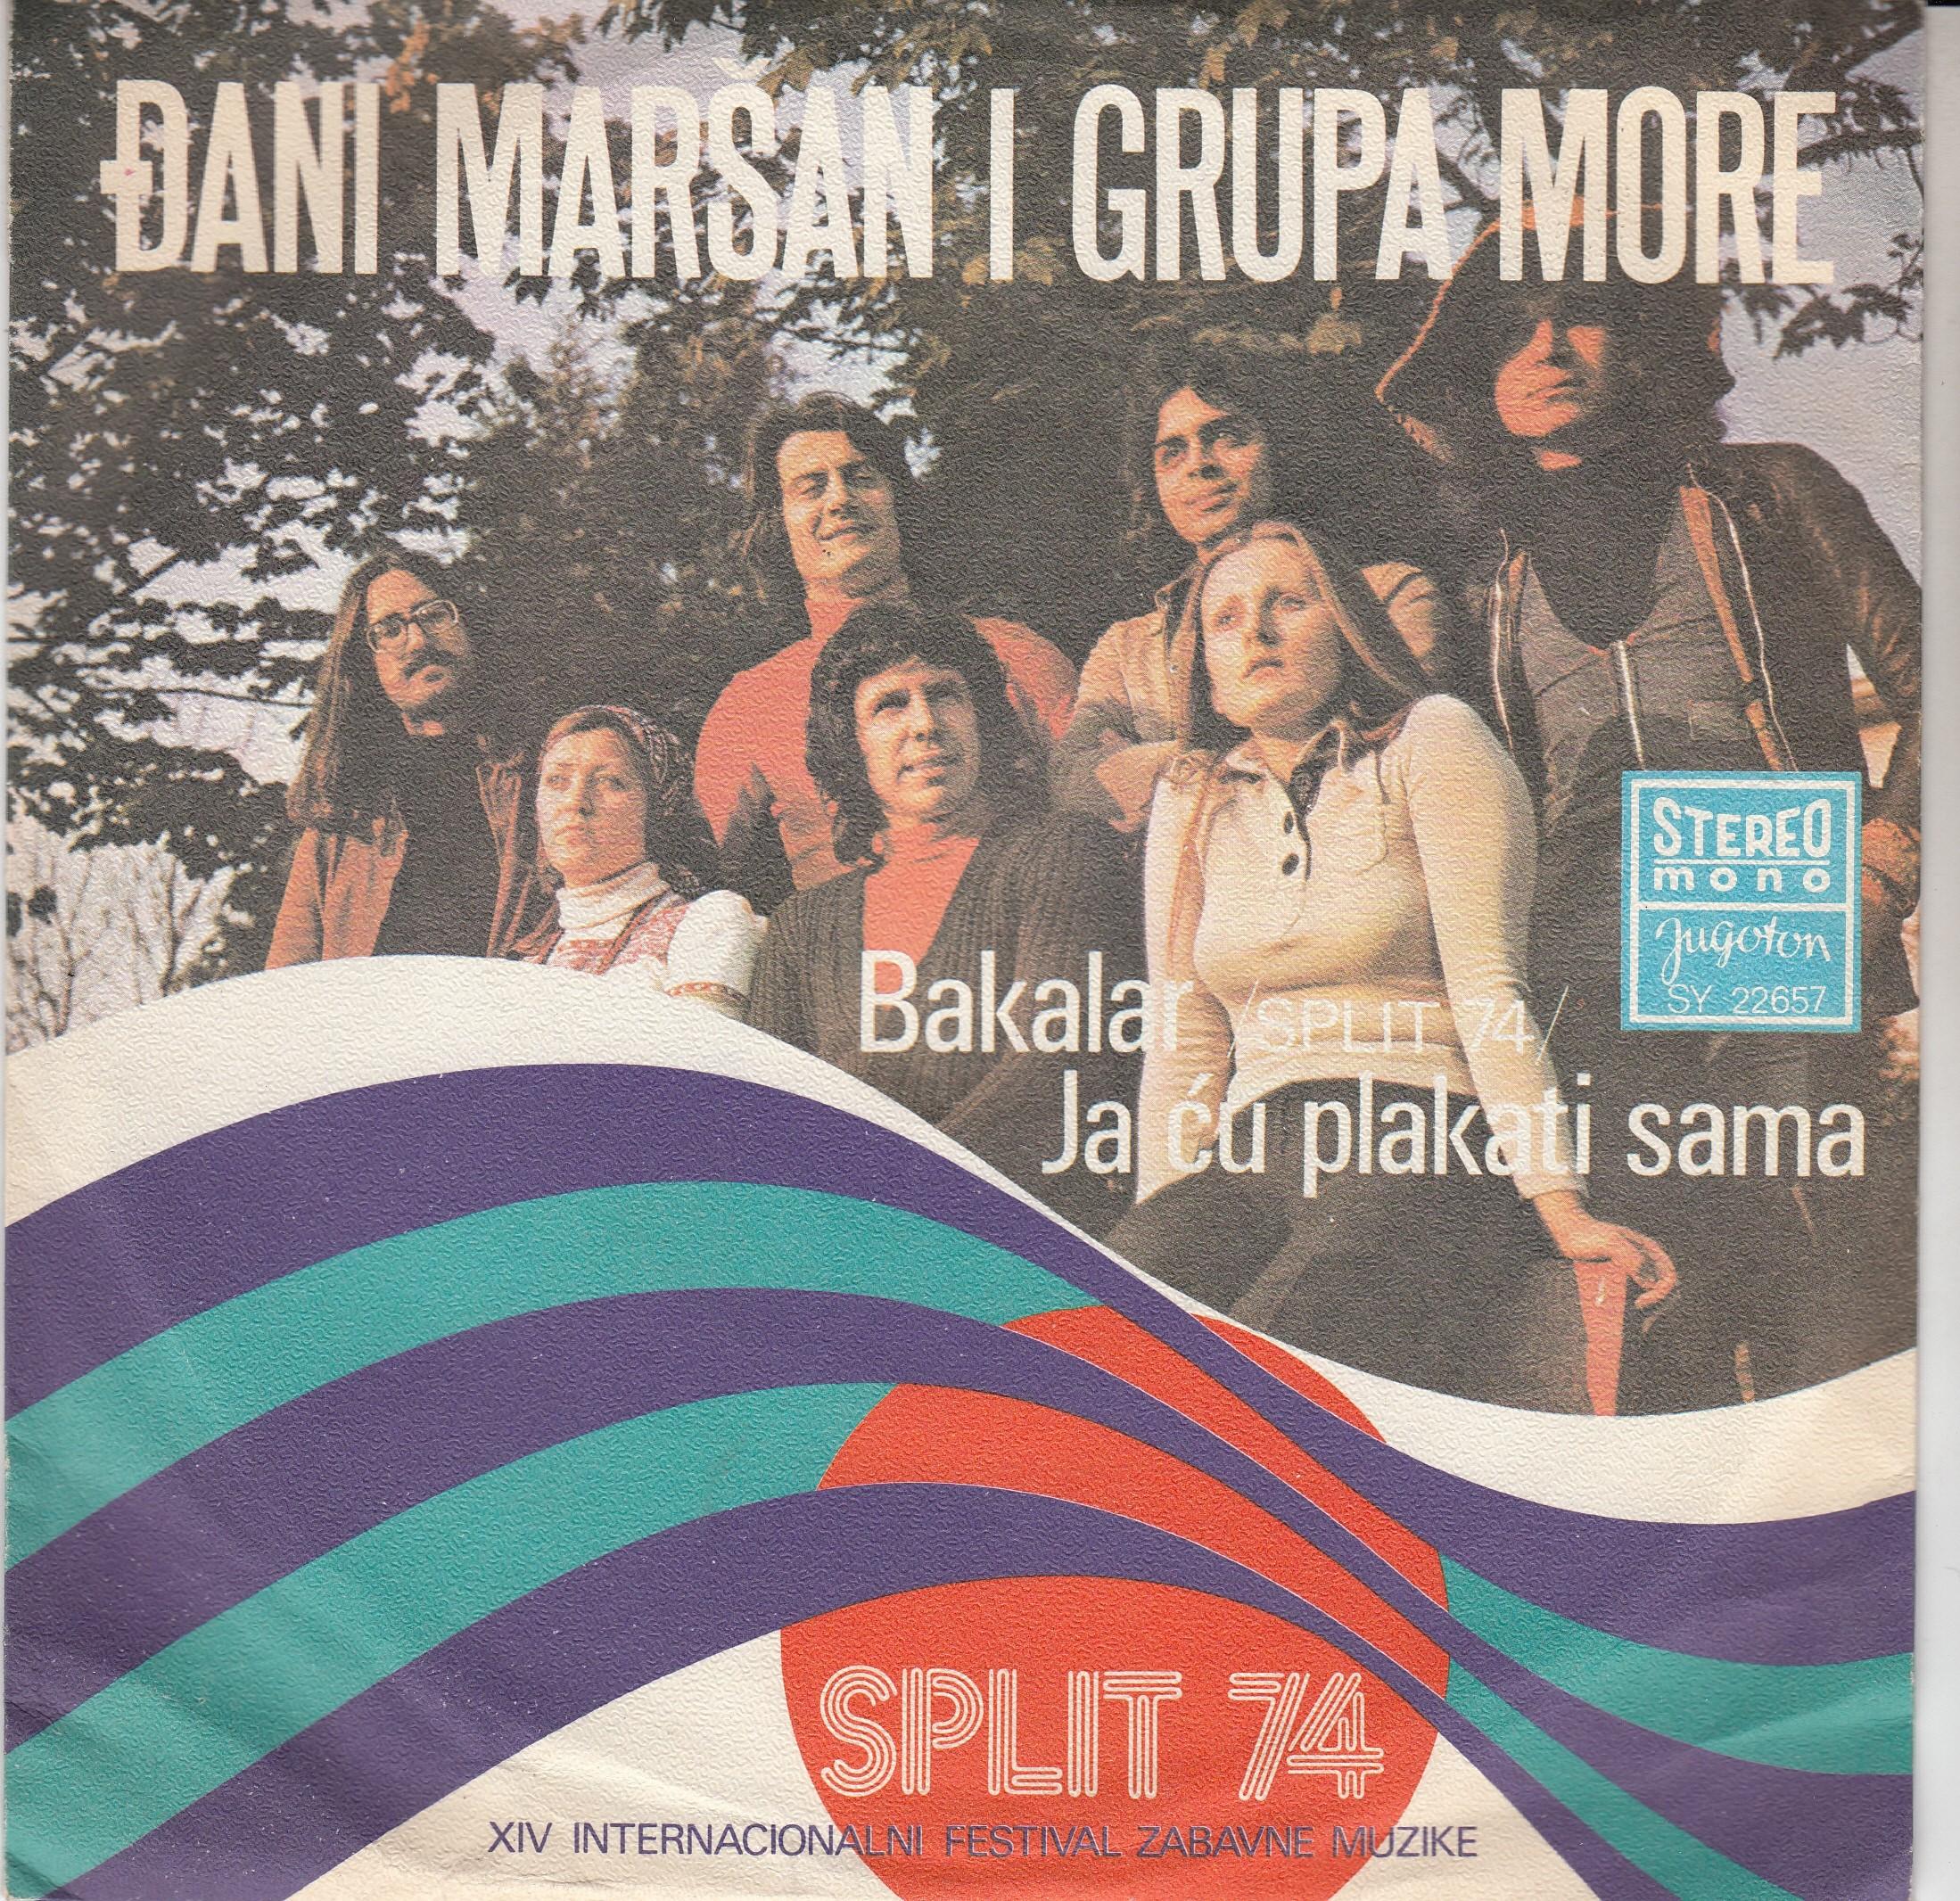 Marsan Djani Grupa More - Bakalar/ja Cu Plakati Sama